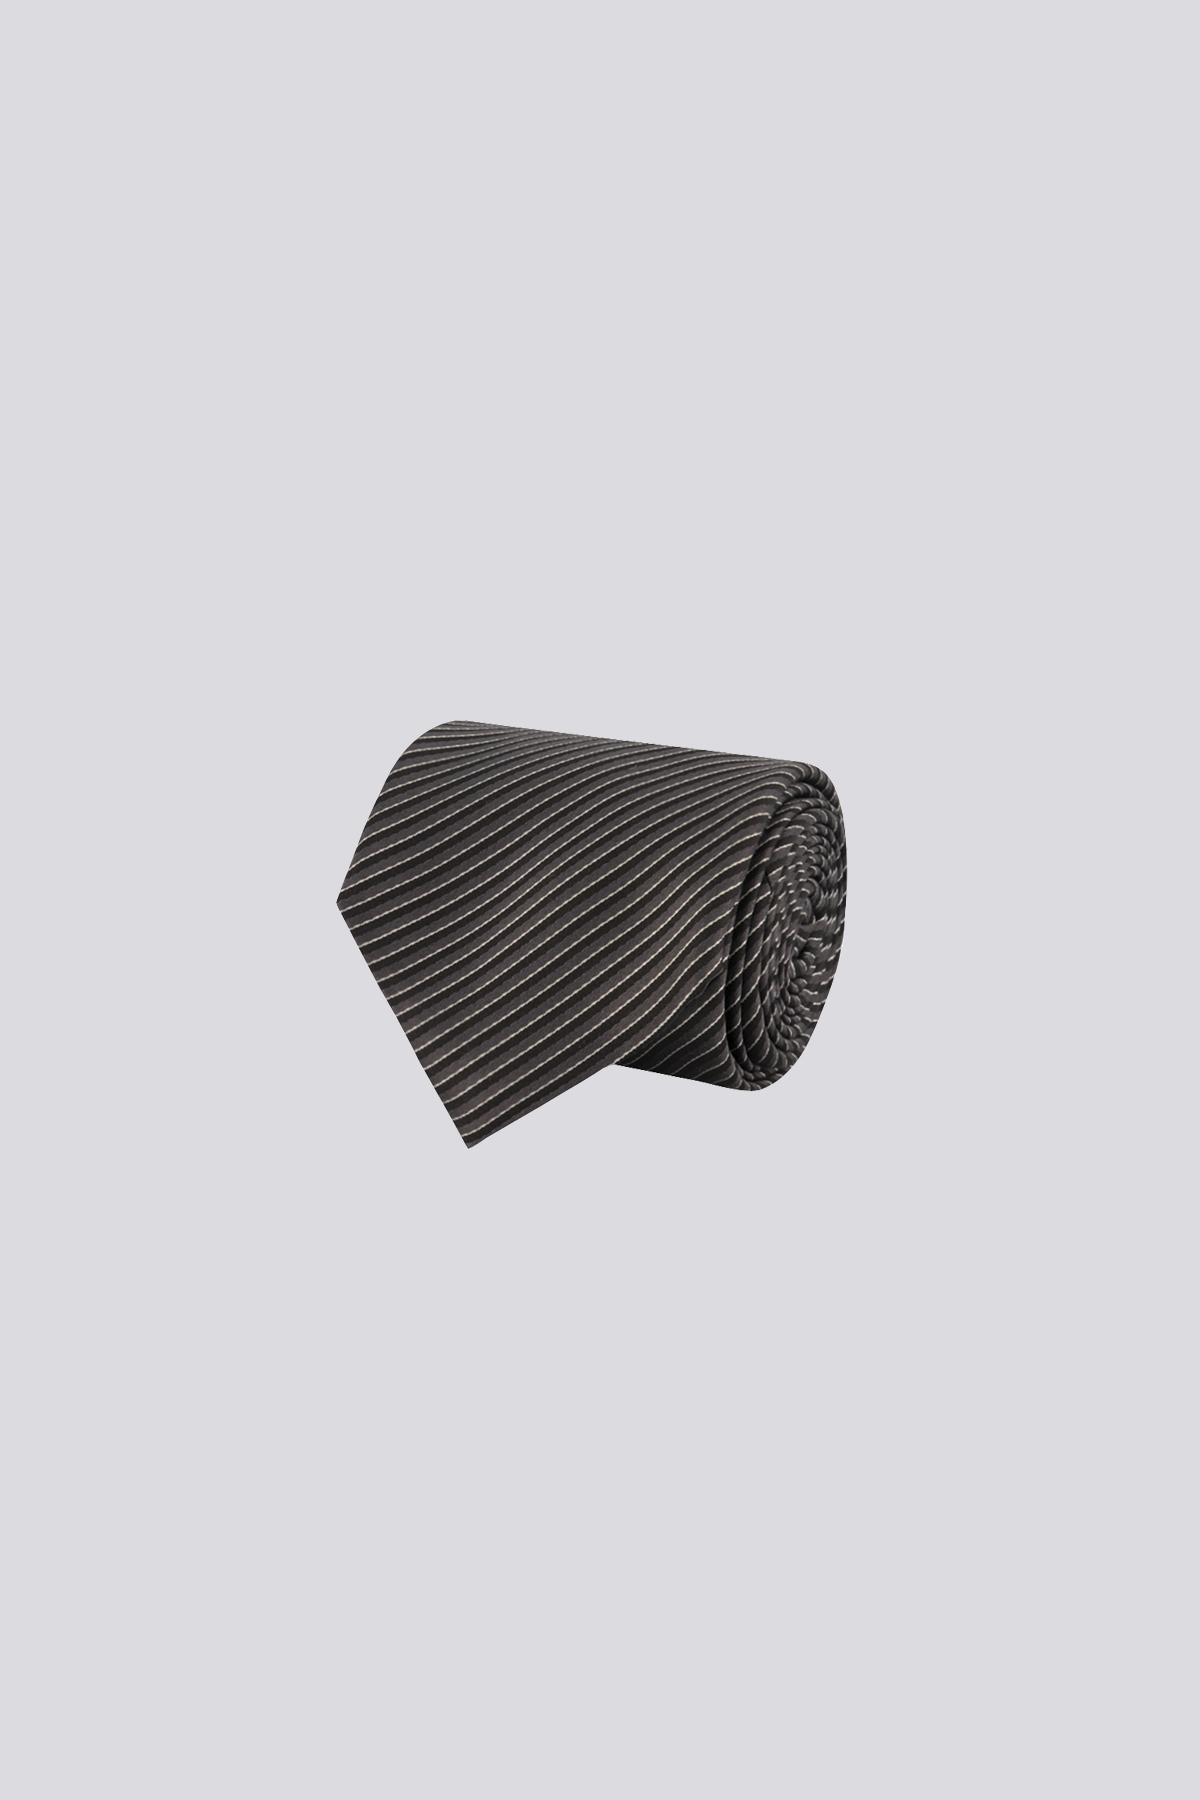 Corbata de seda marca CANALI negro con rayas a contraste